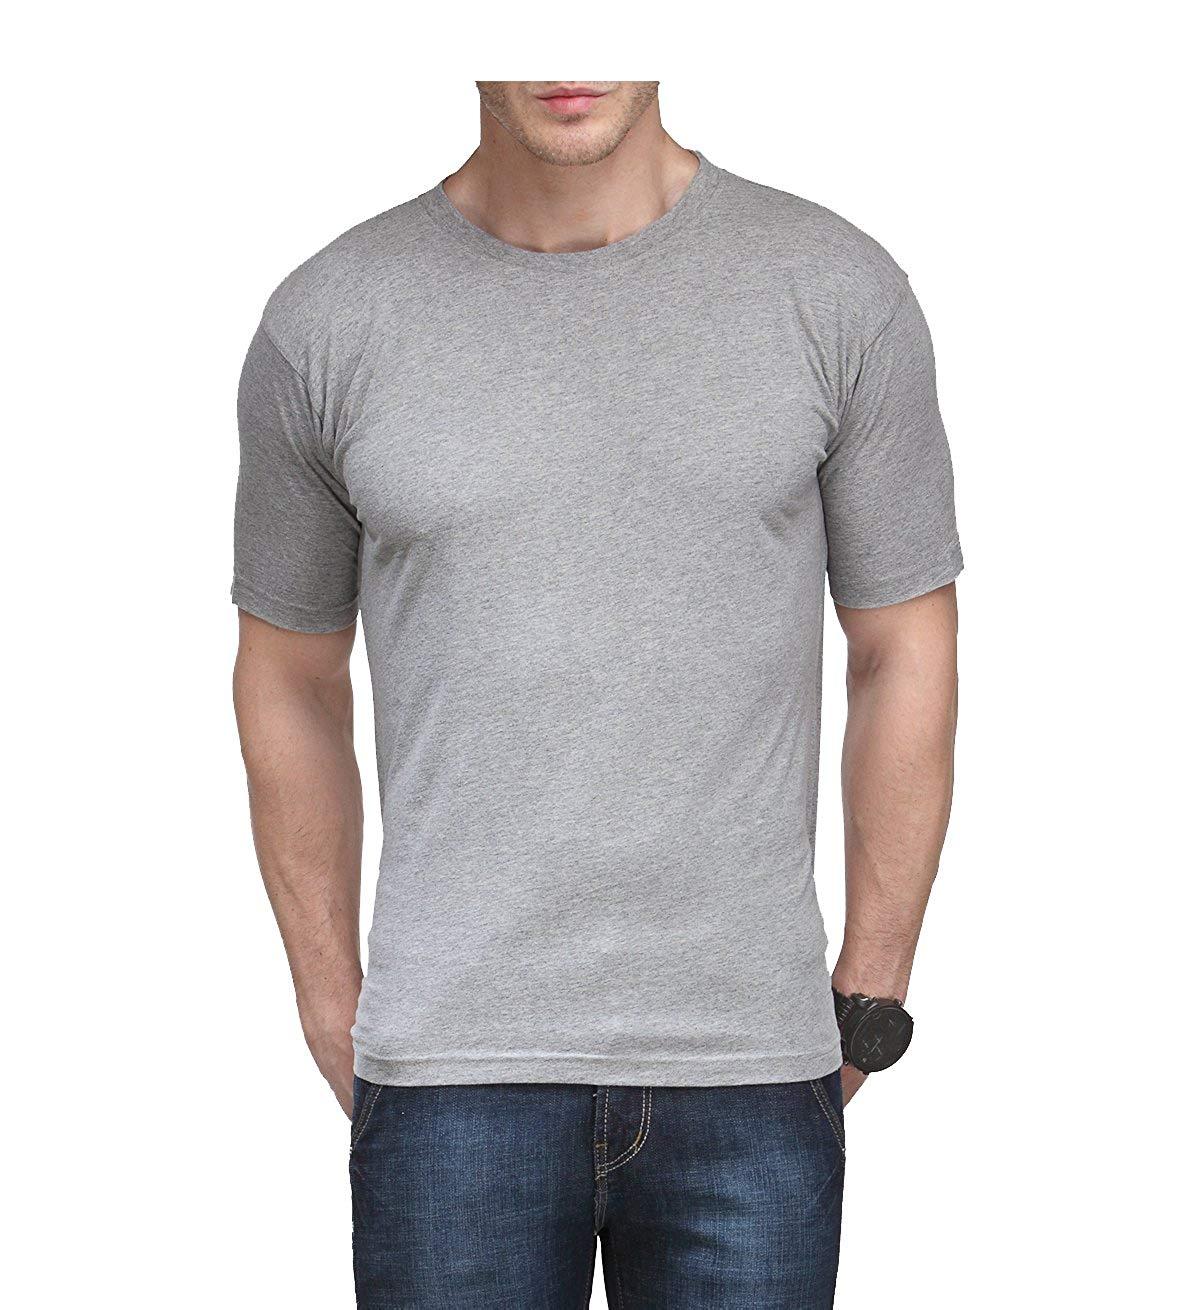 frank-west-t-shirt